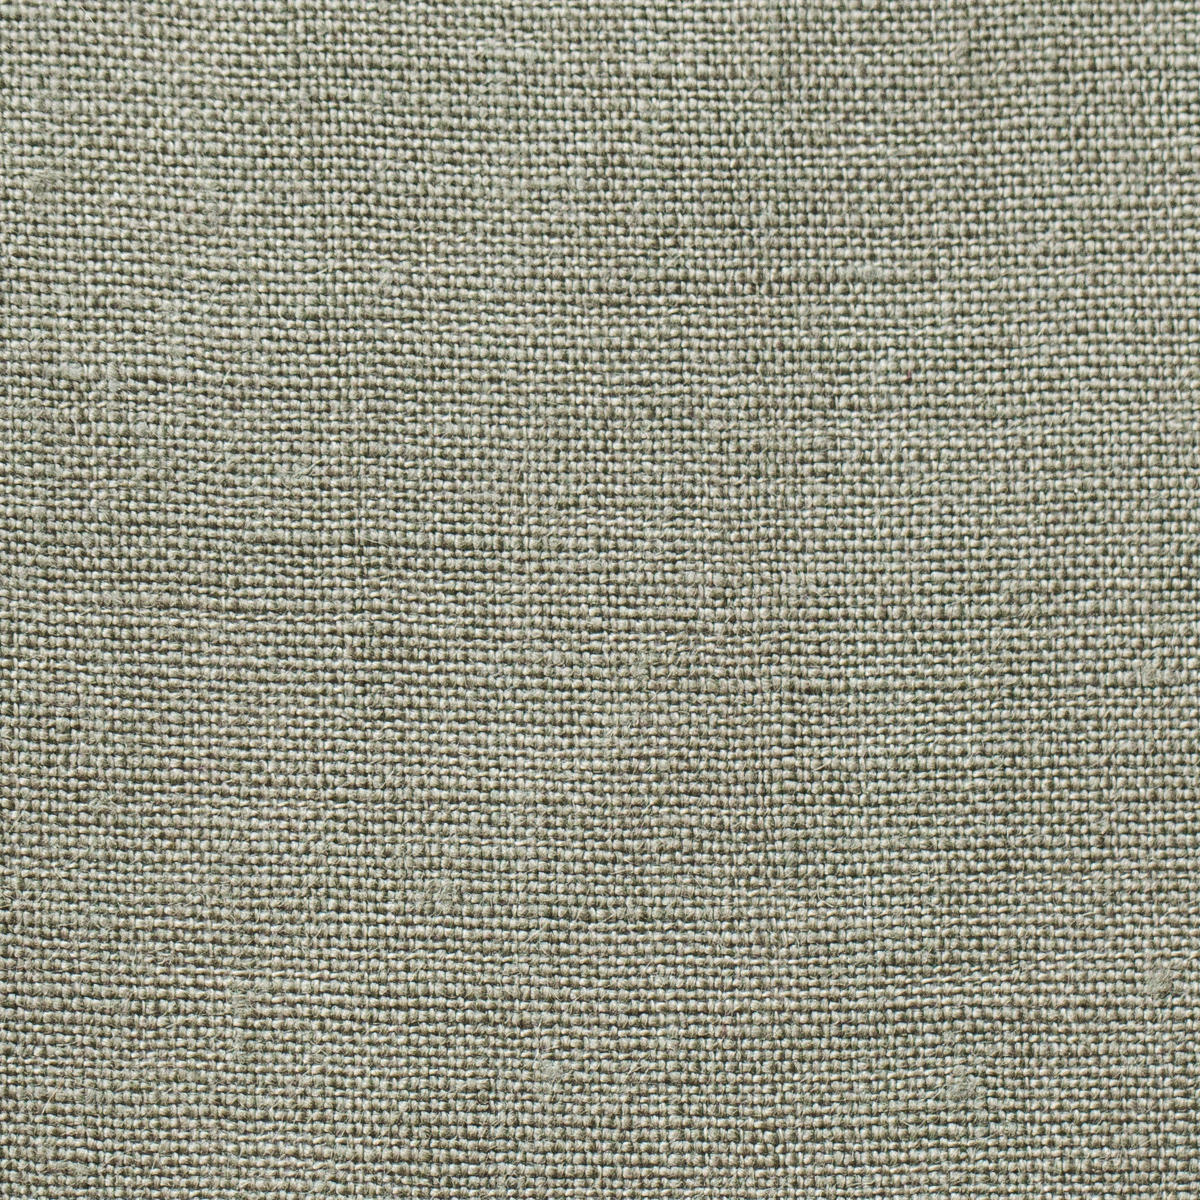 Wedding album fabric swatch sample, forest